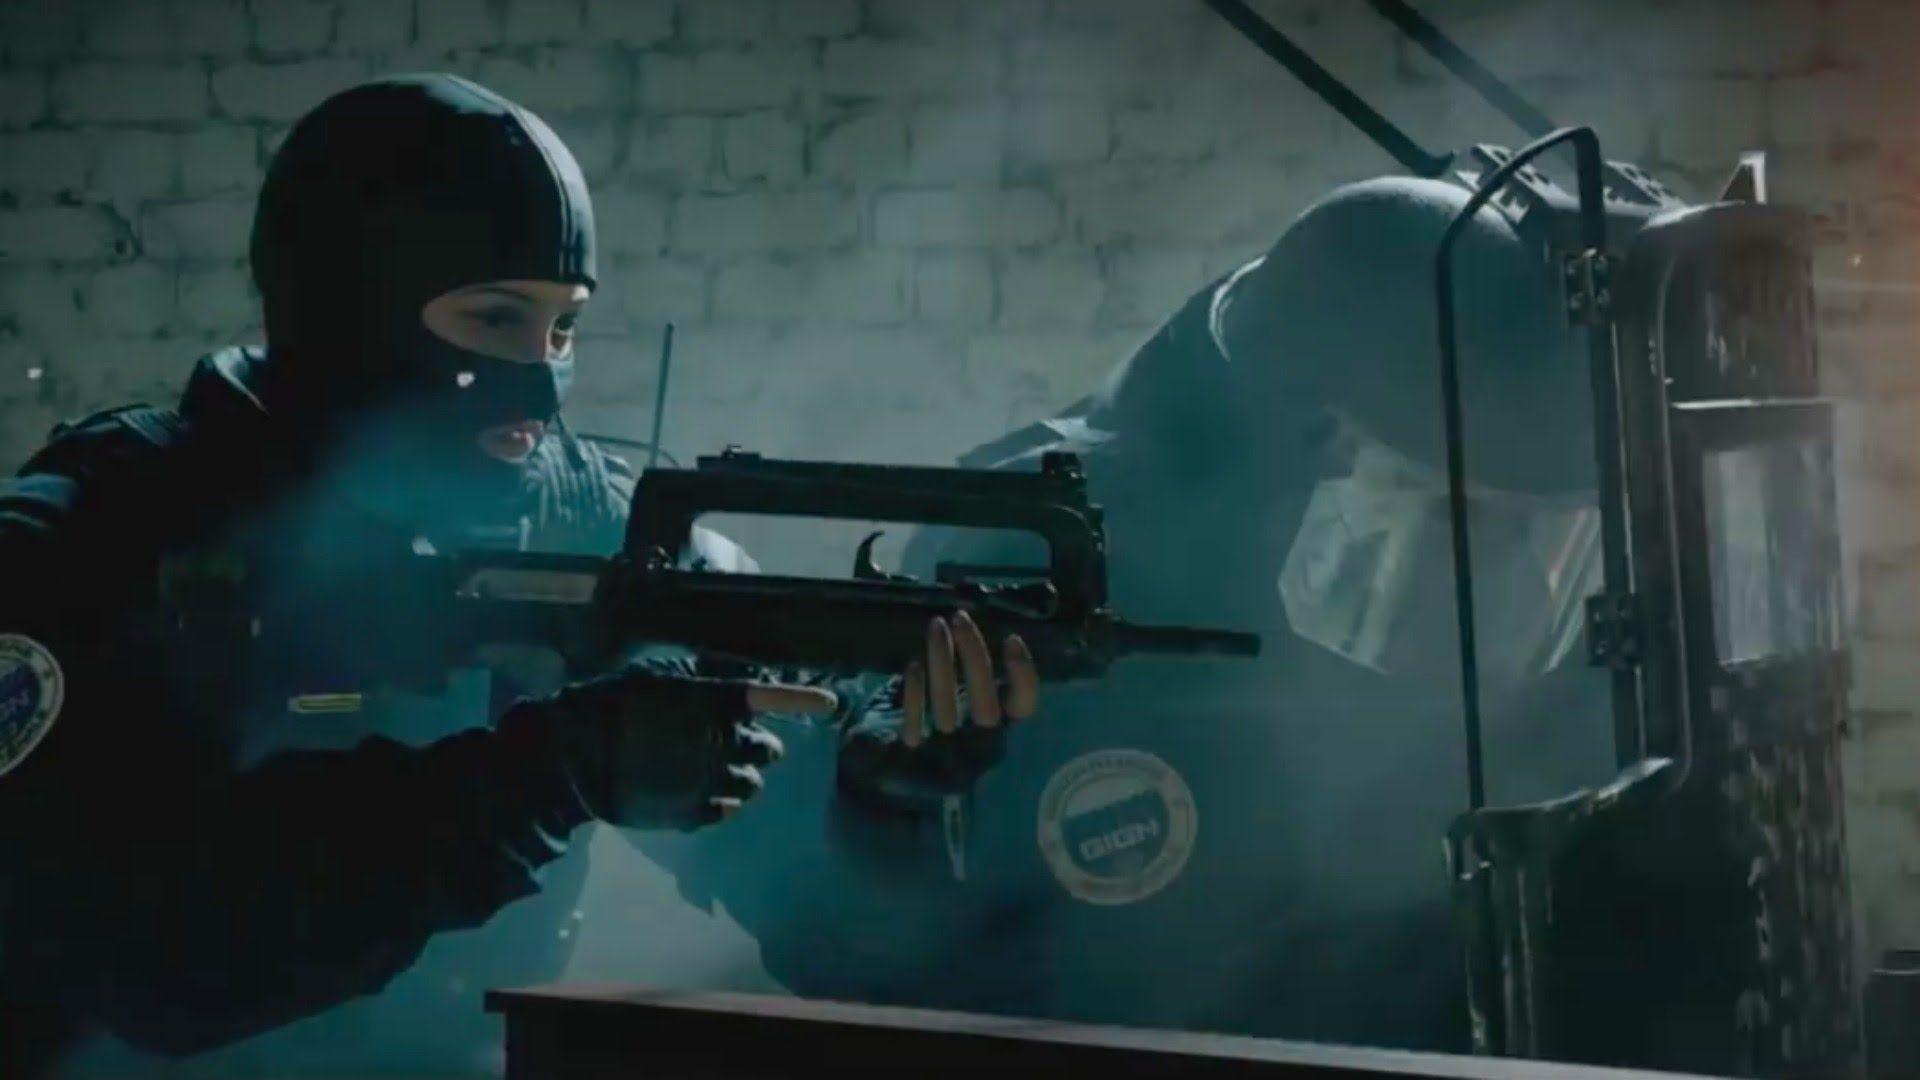 Tom Clancy S Rainbow Six Siege The Breach Launch Trailer Tom Clancy S Rainbow Six Tom Clancy Video Game Reviews